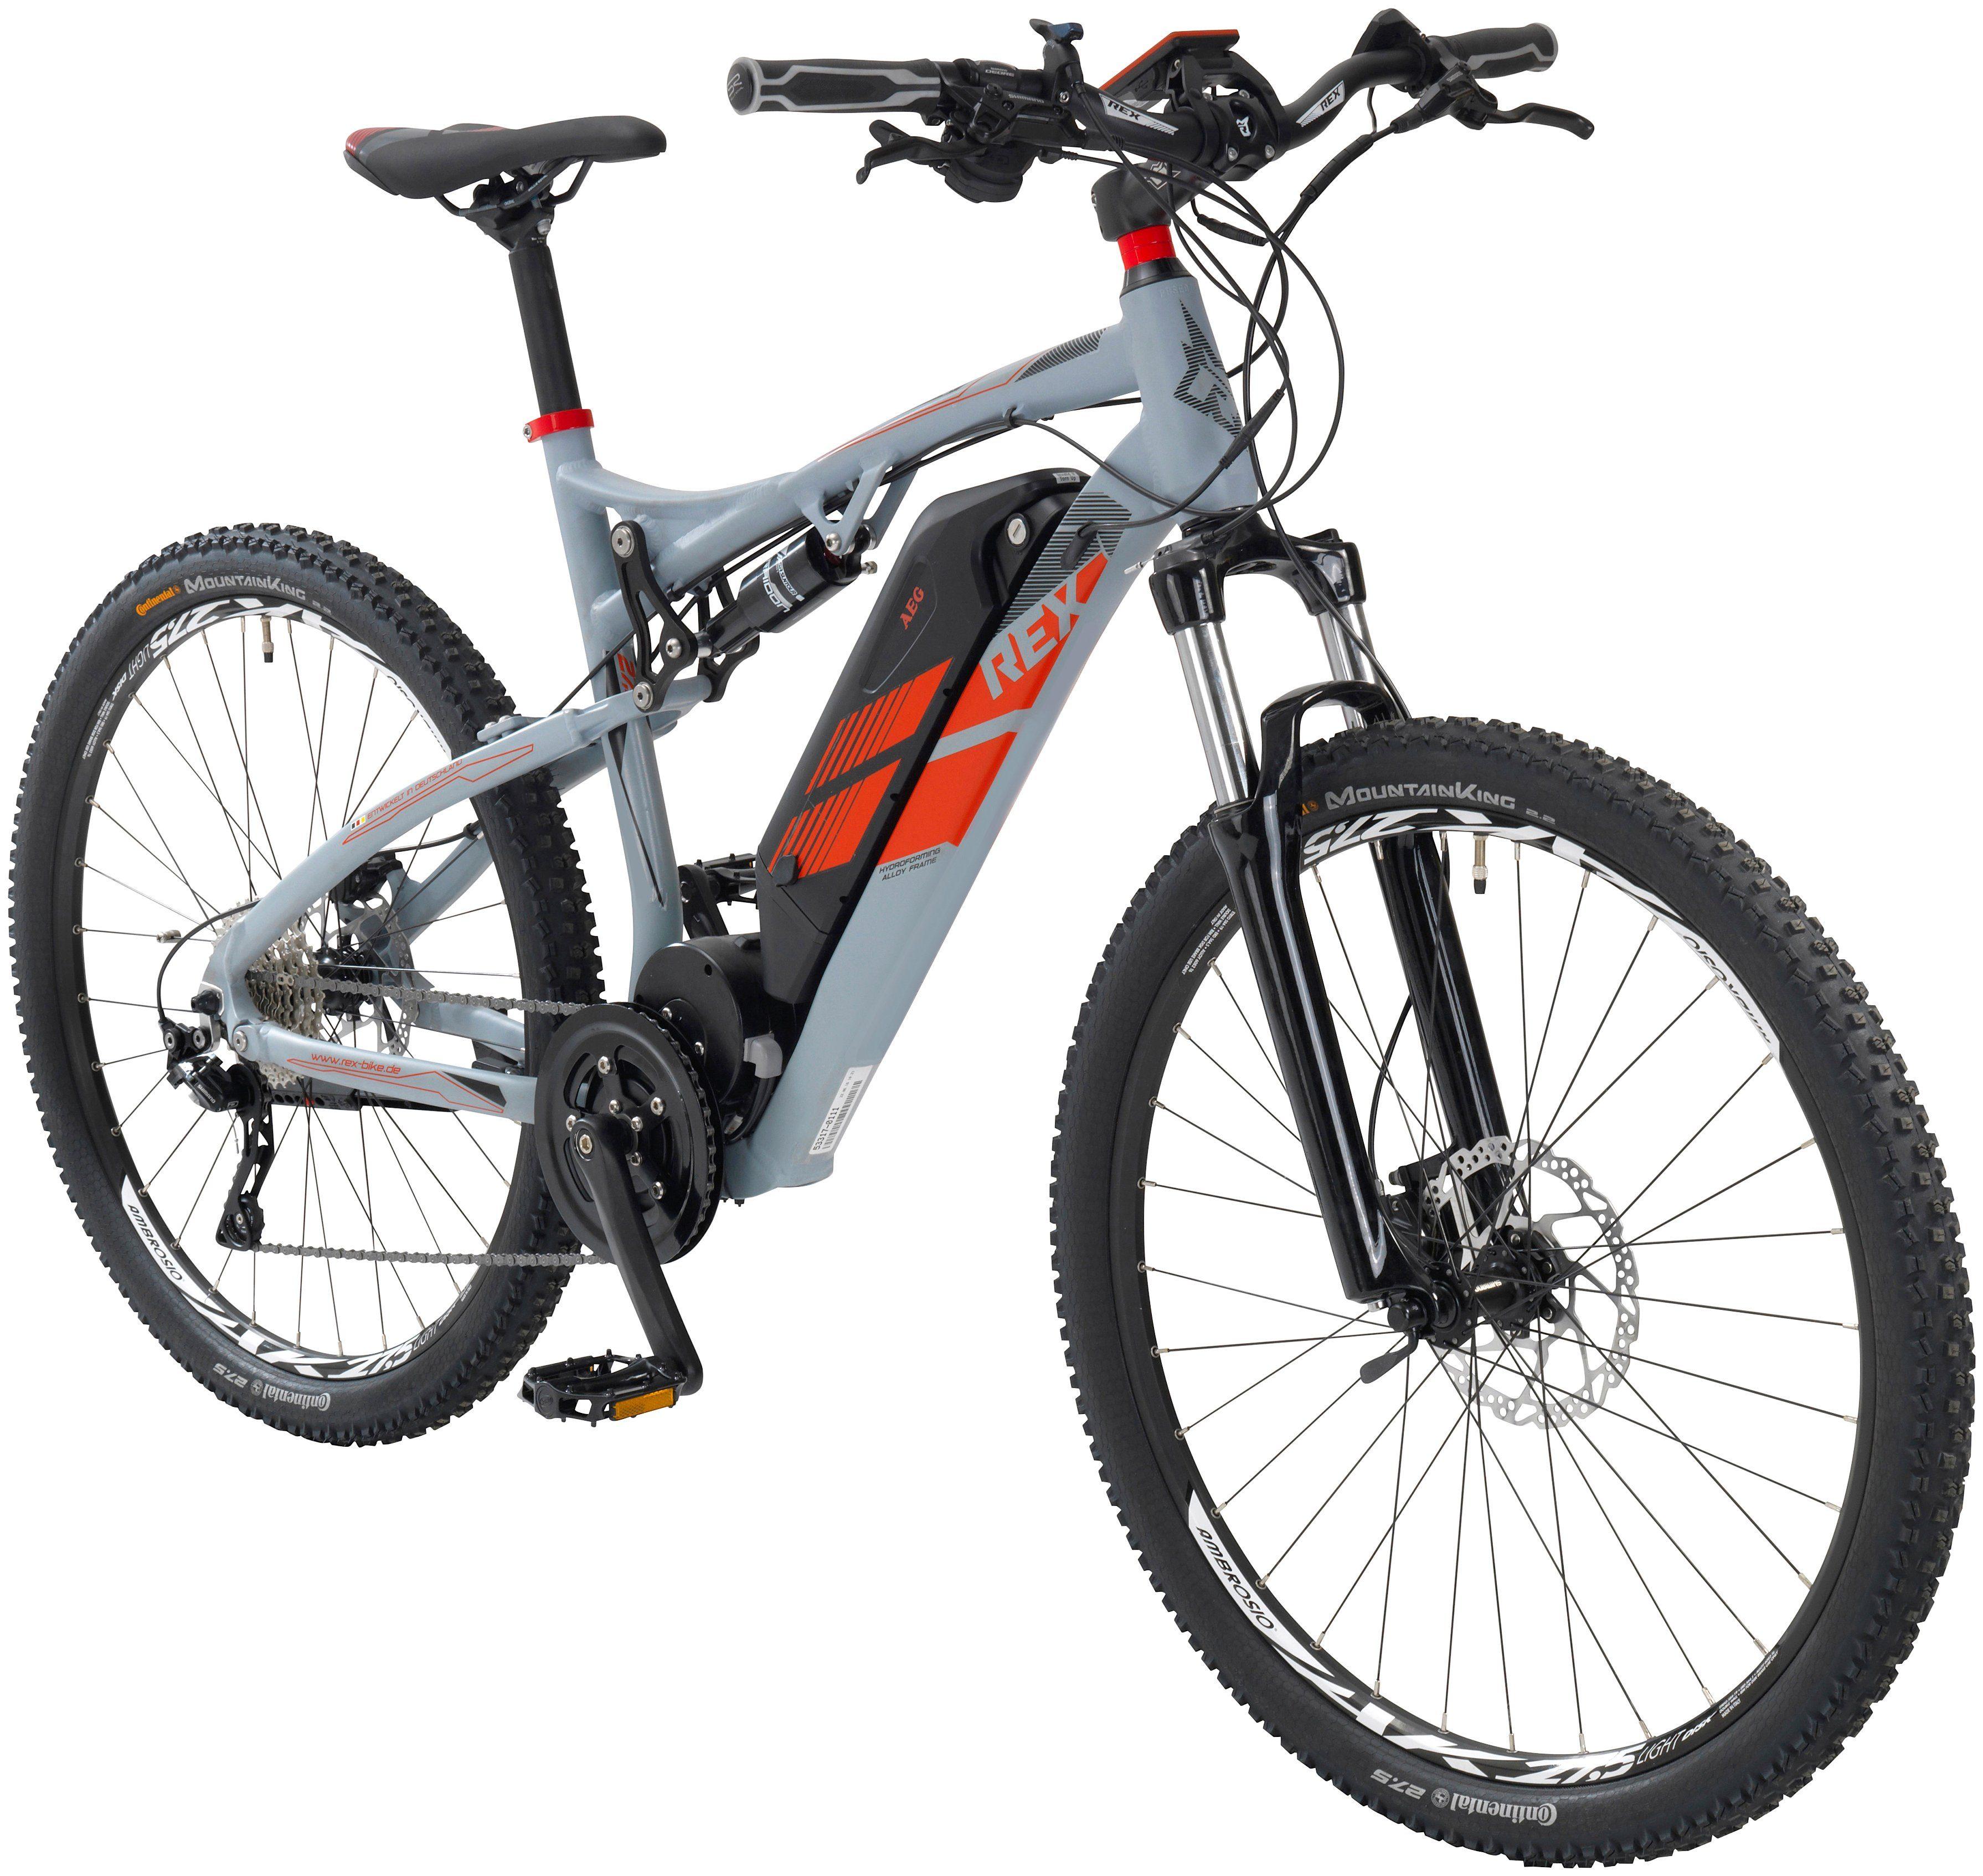 REX E-Bike Mountainbike , 27,5 Zoll, 10 Gang, Mittelmotor, 500 Wh